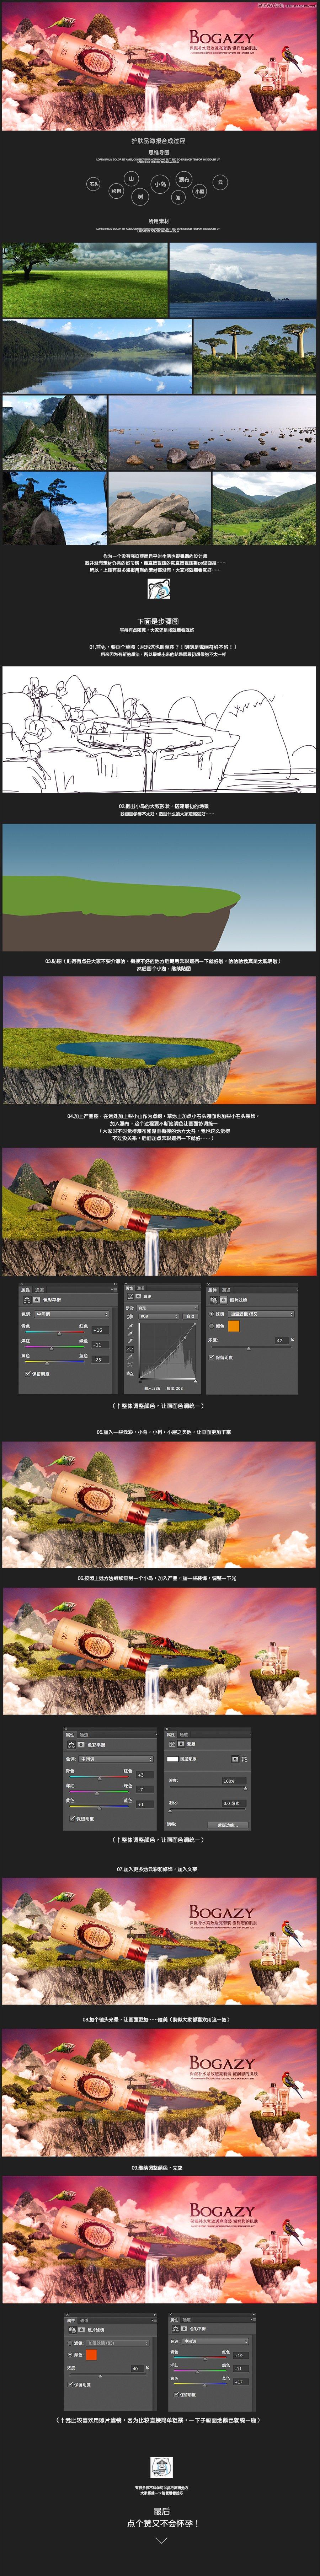 Photoshop合成大气的护肤品海报设计教程